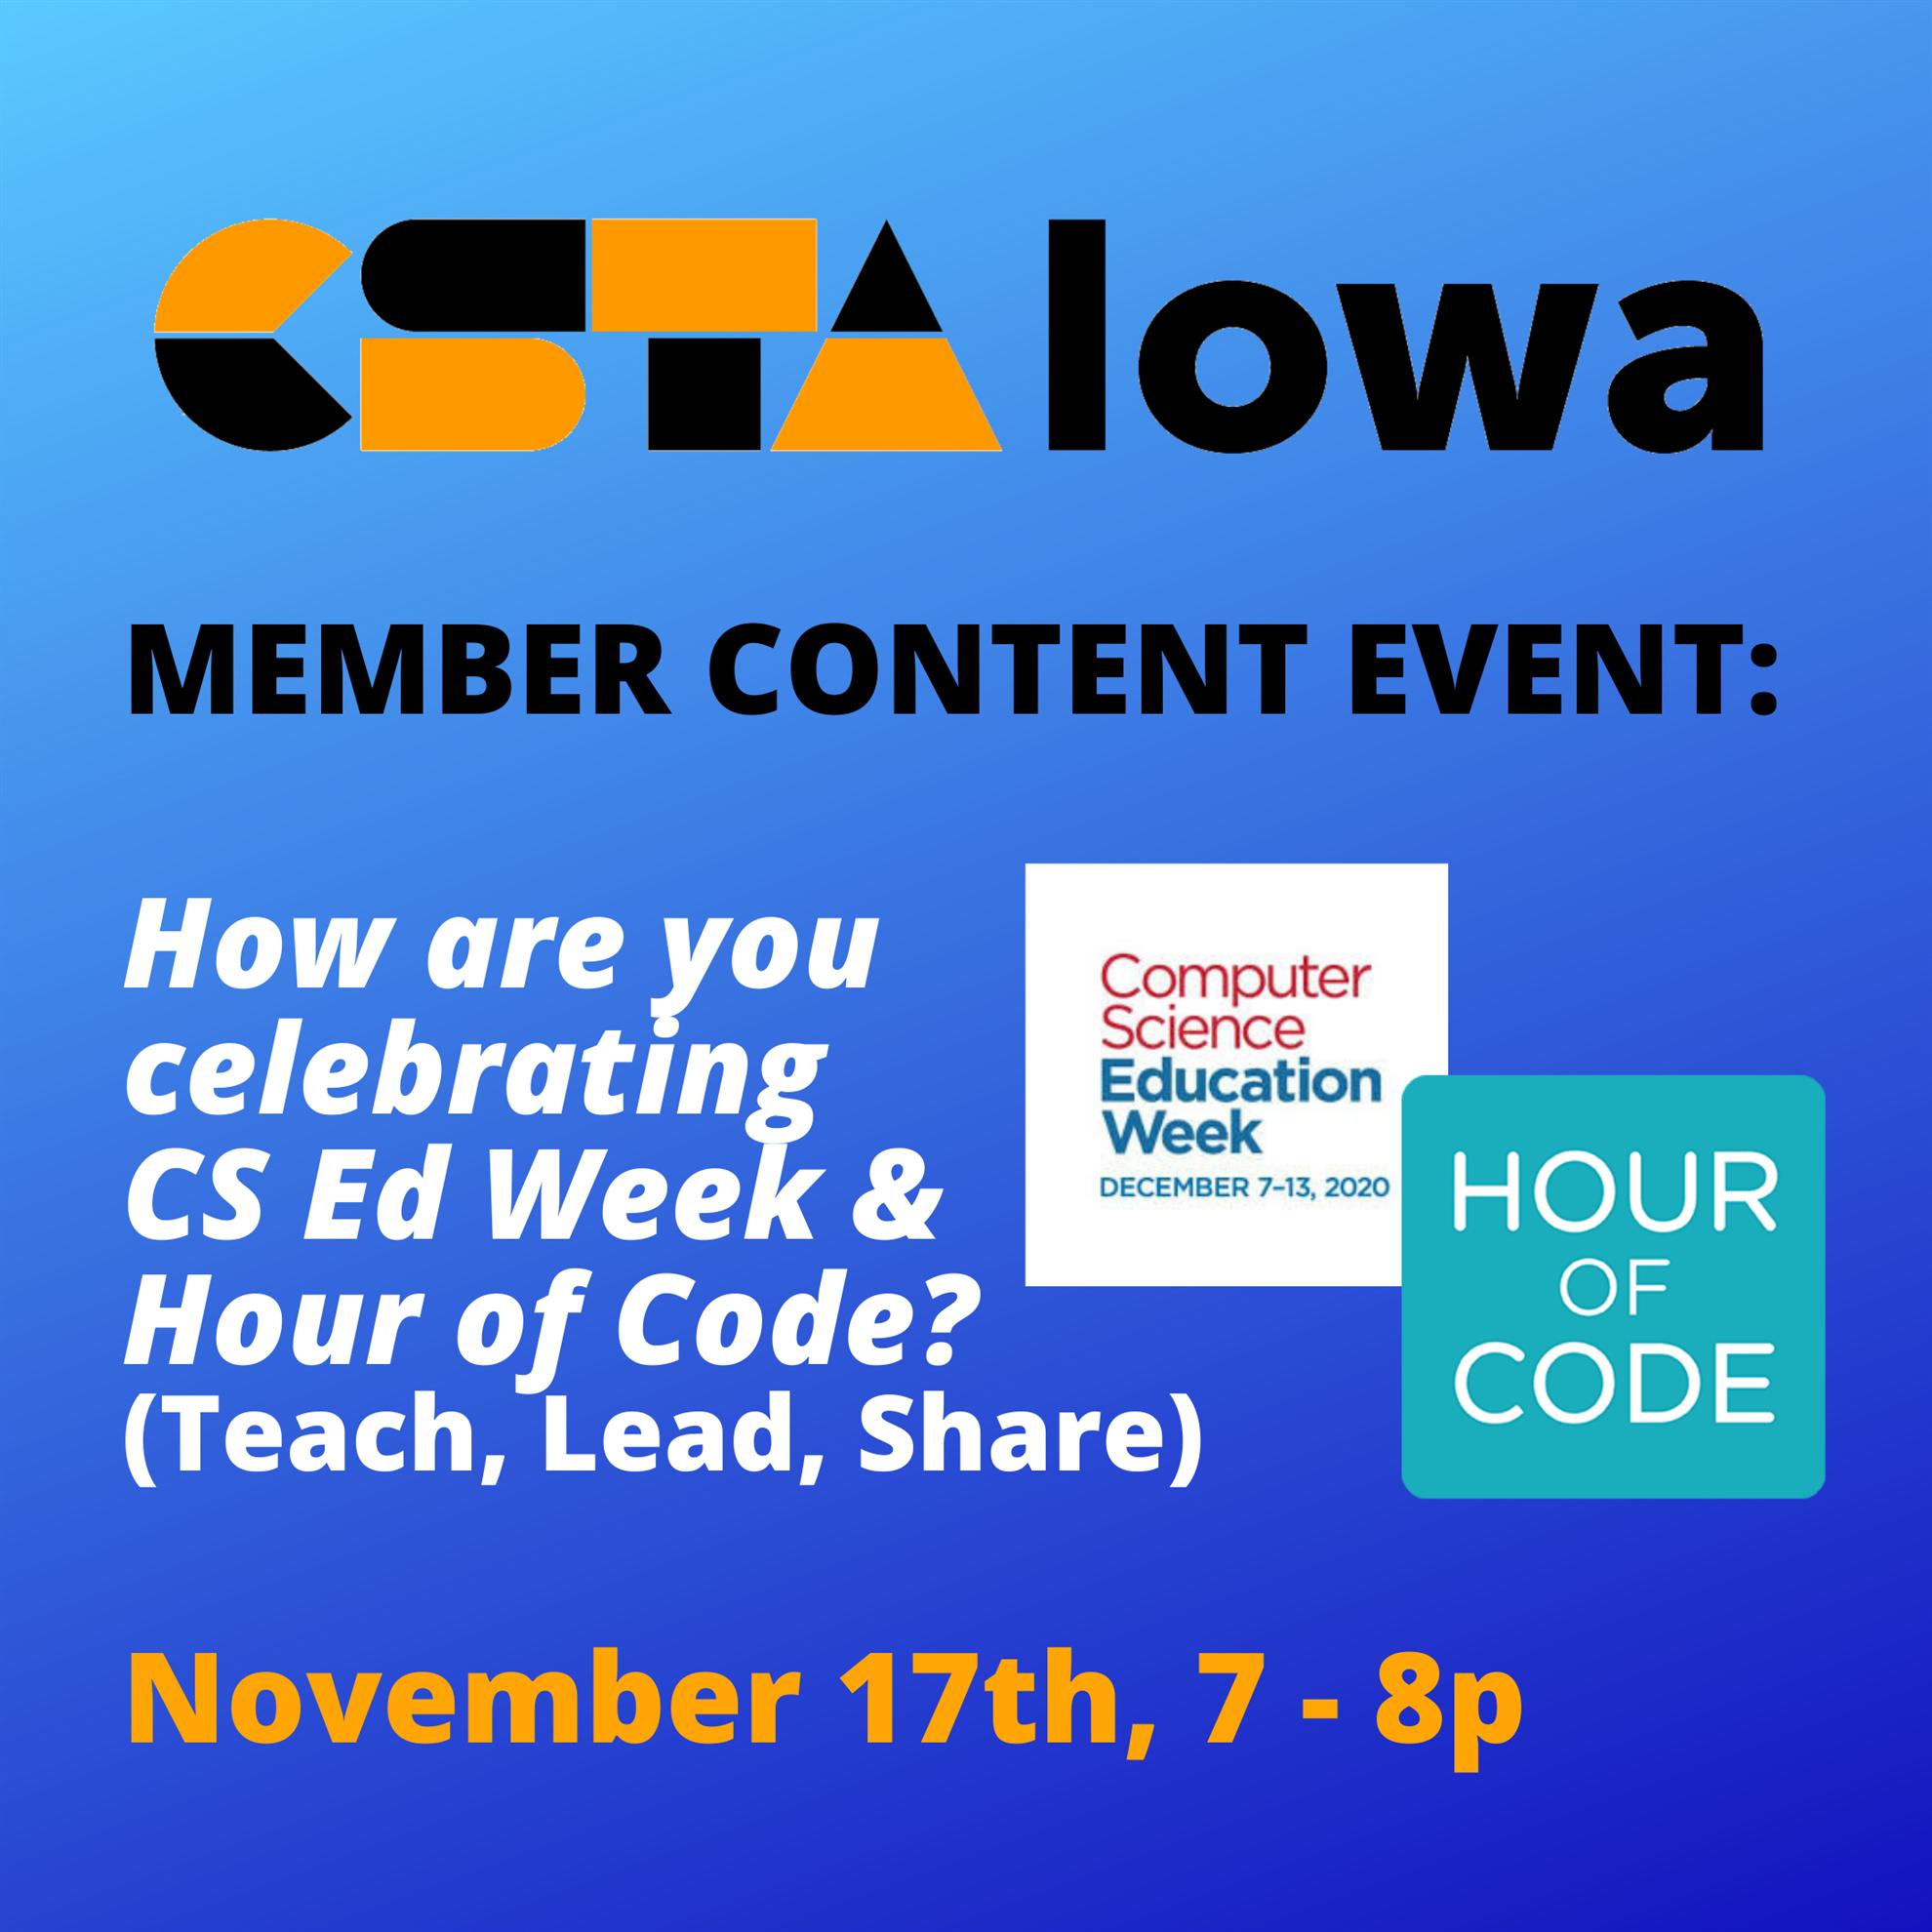 CSTA Iowa Member Meeting - How will you celebrate CSEd Week & Hour of Code?